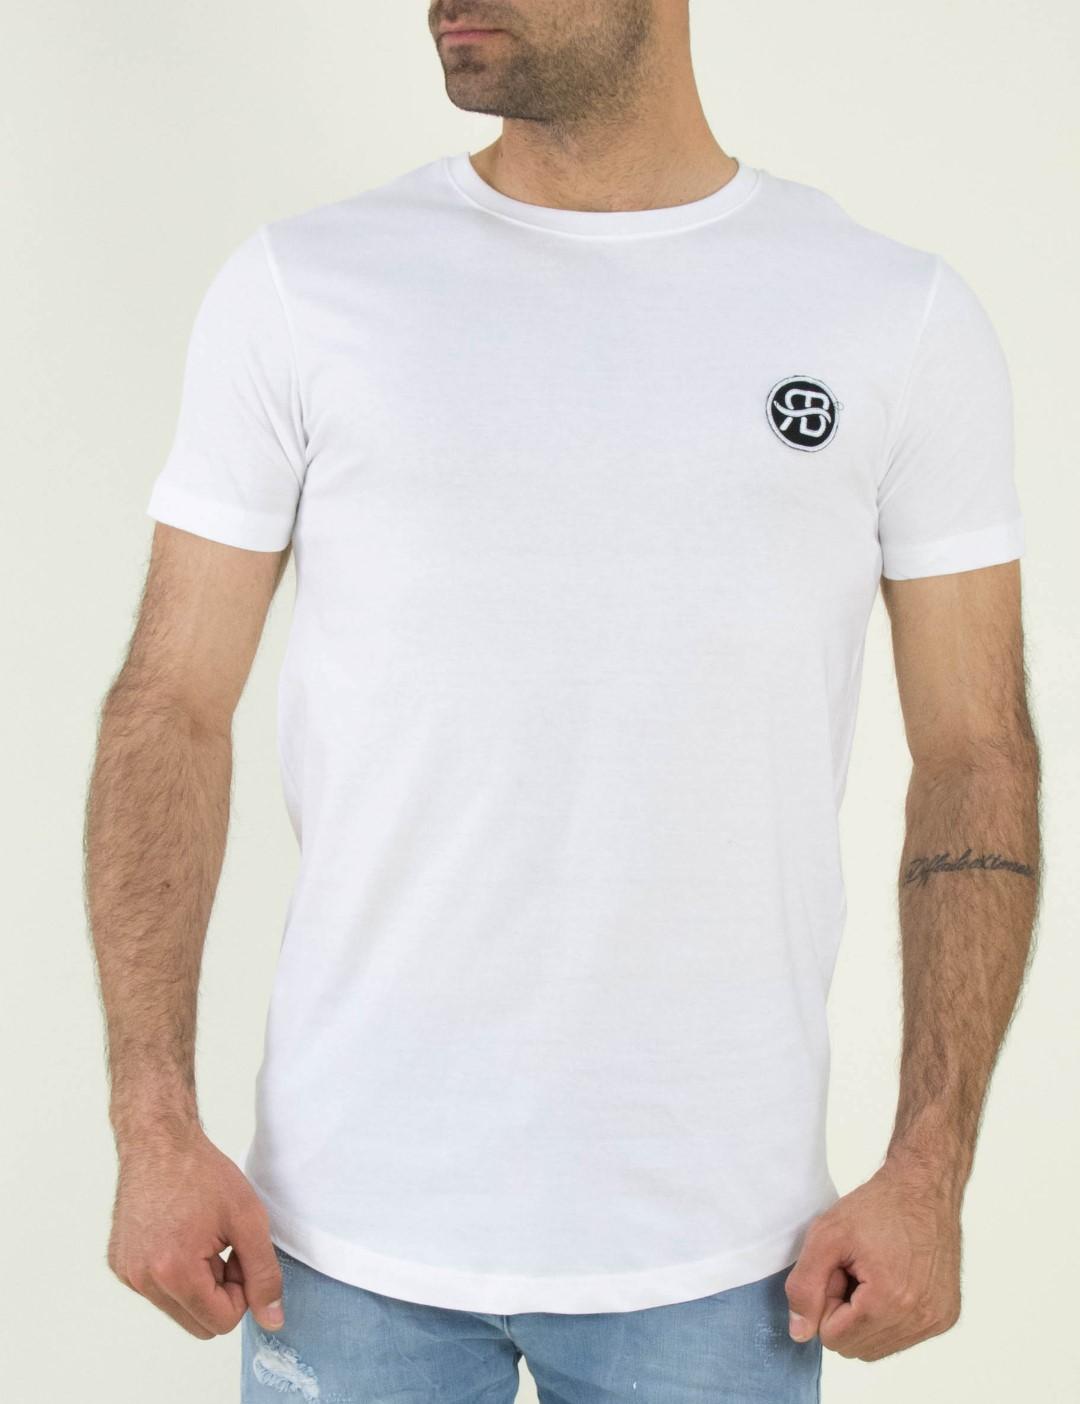 565a542d19a0 Ανδρικό λευκό βαμβακερό Tshirt τύπωμα 06705D